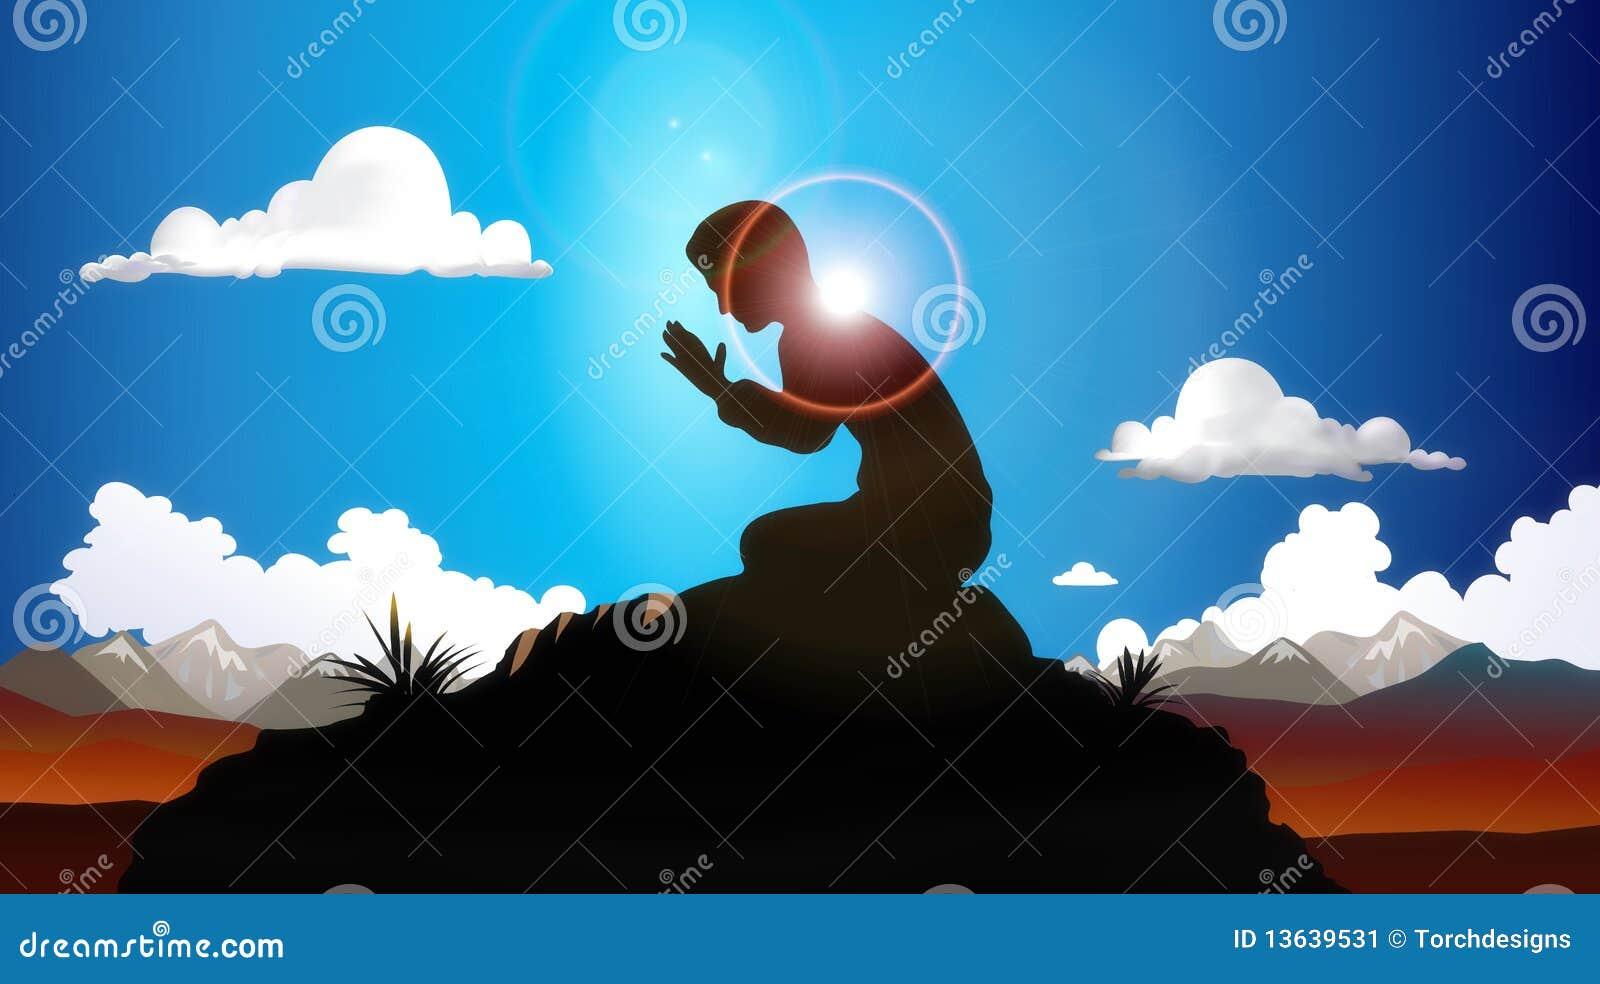 Beten an der Dämmerung stock abbildung. Illustration von ...